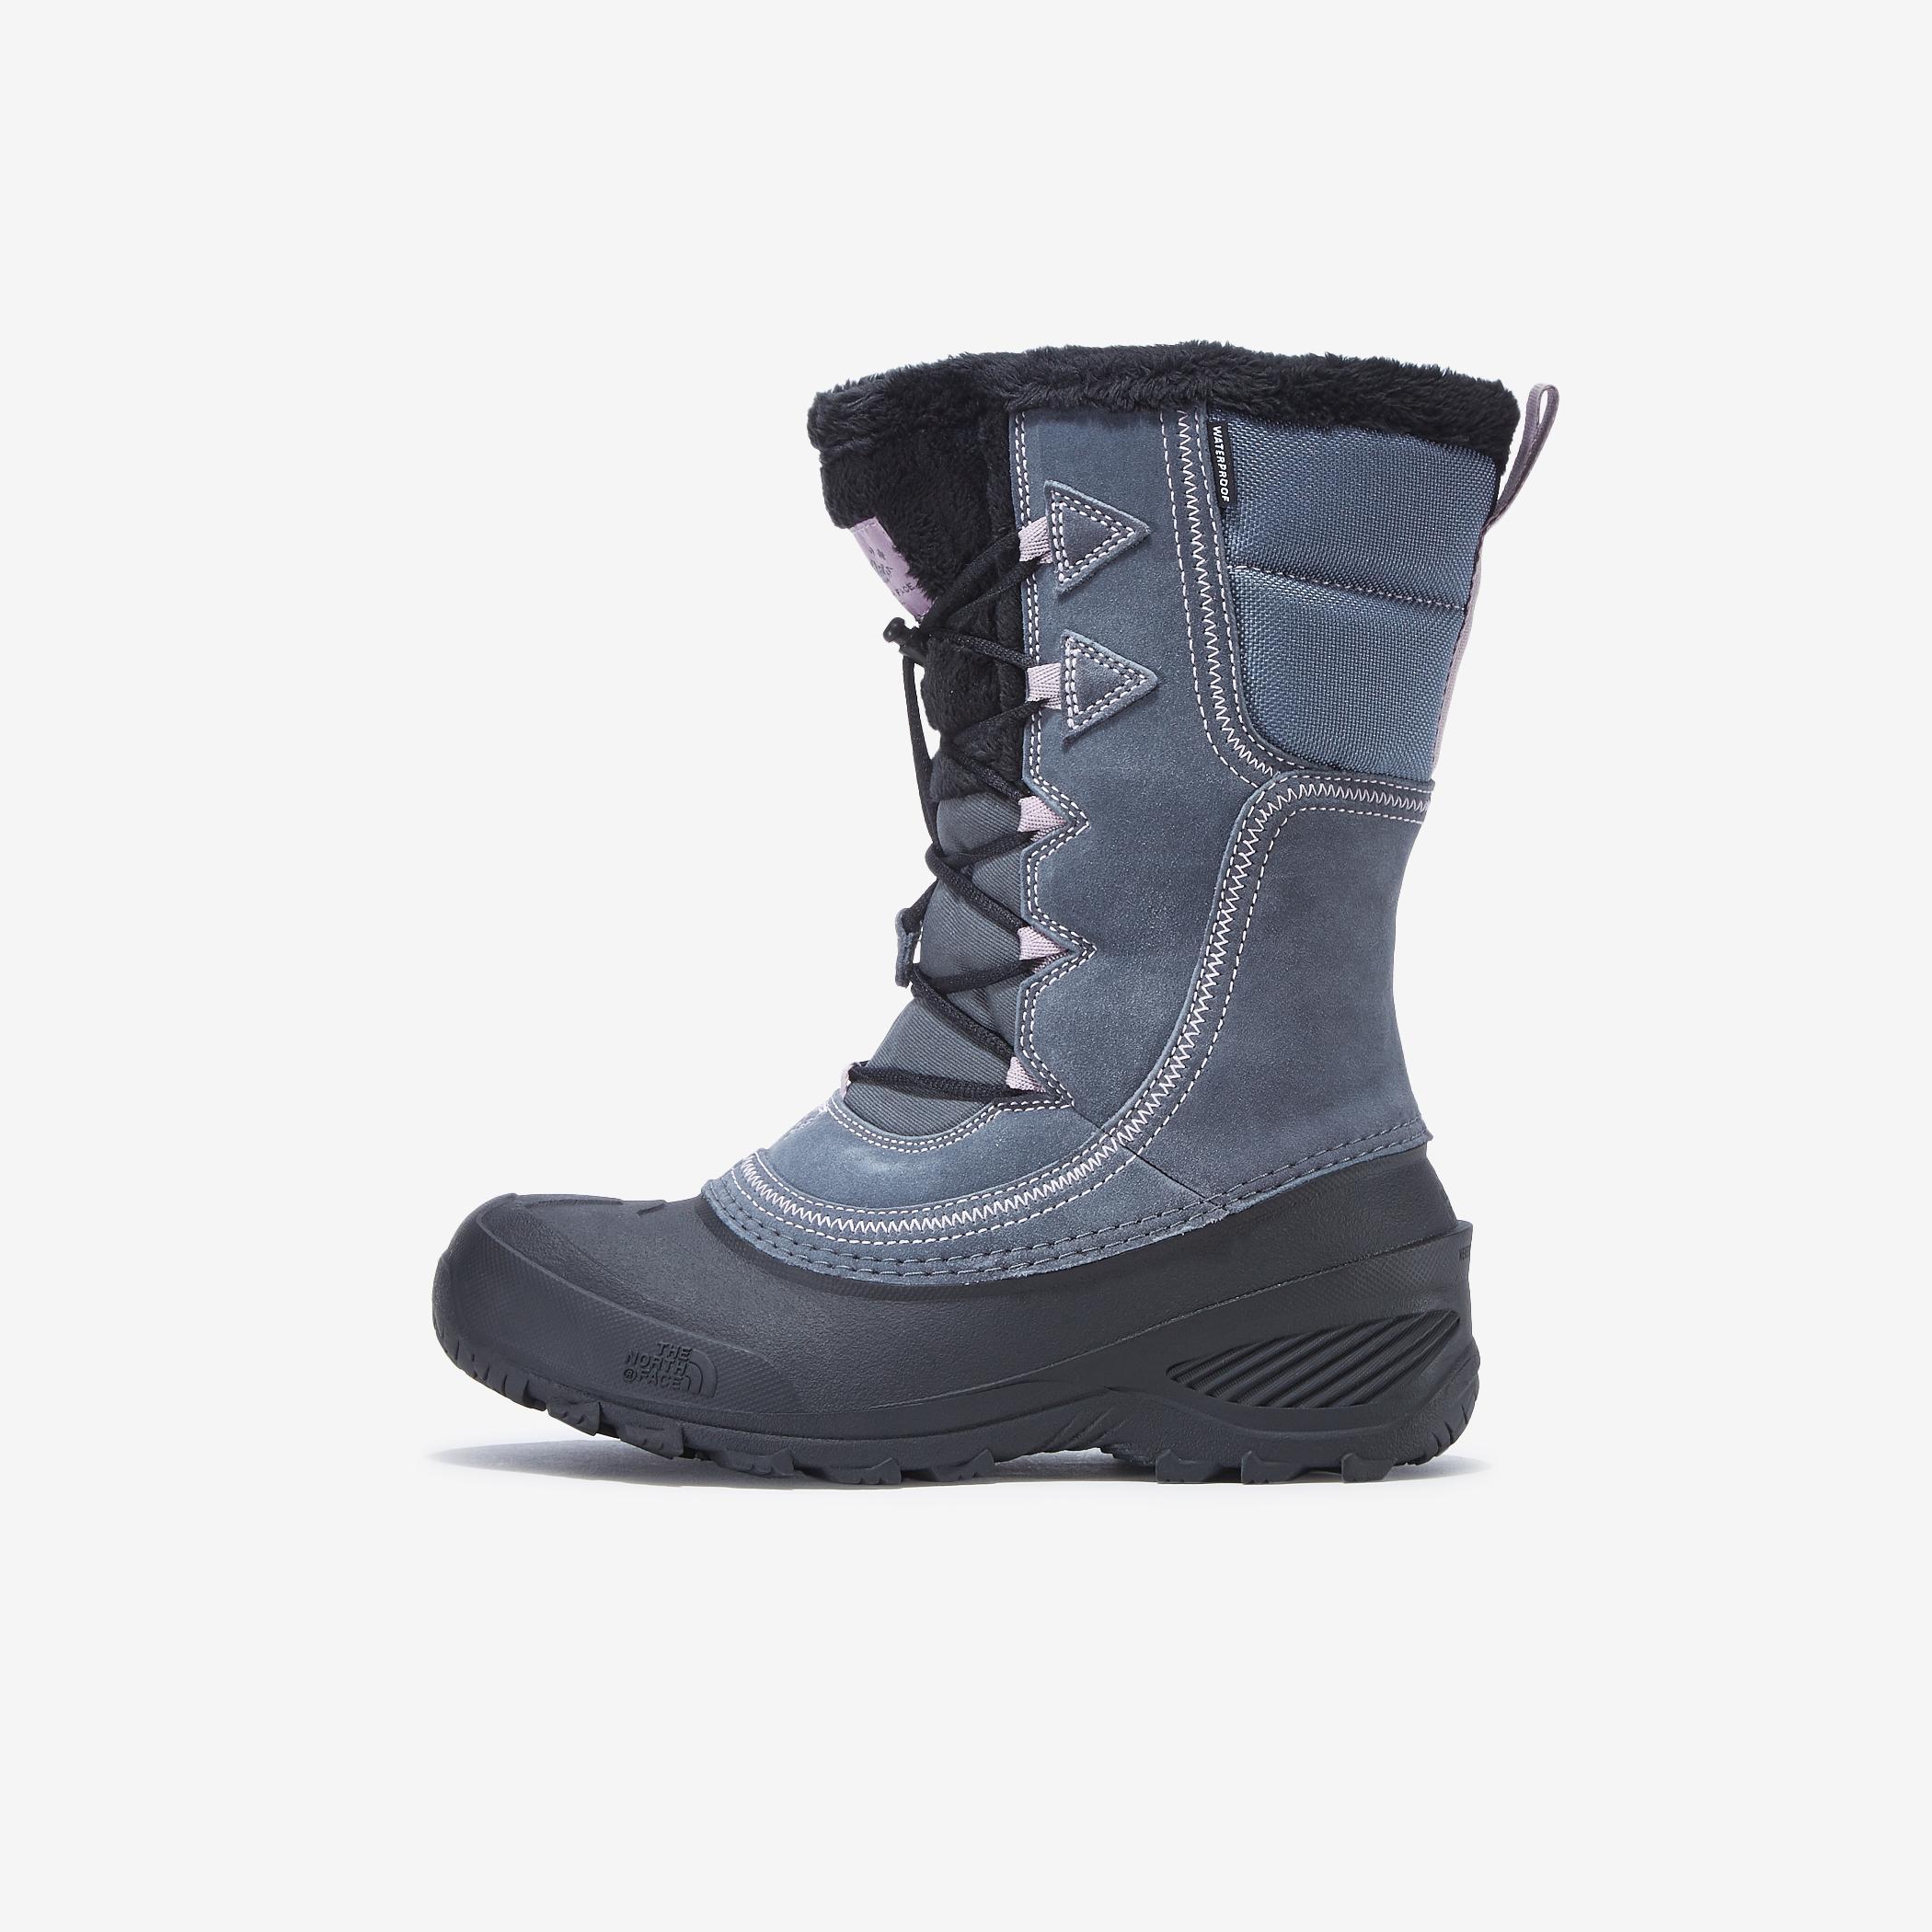 Shellista Lace Iv Boots